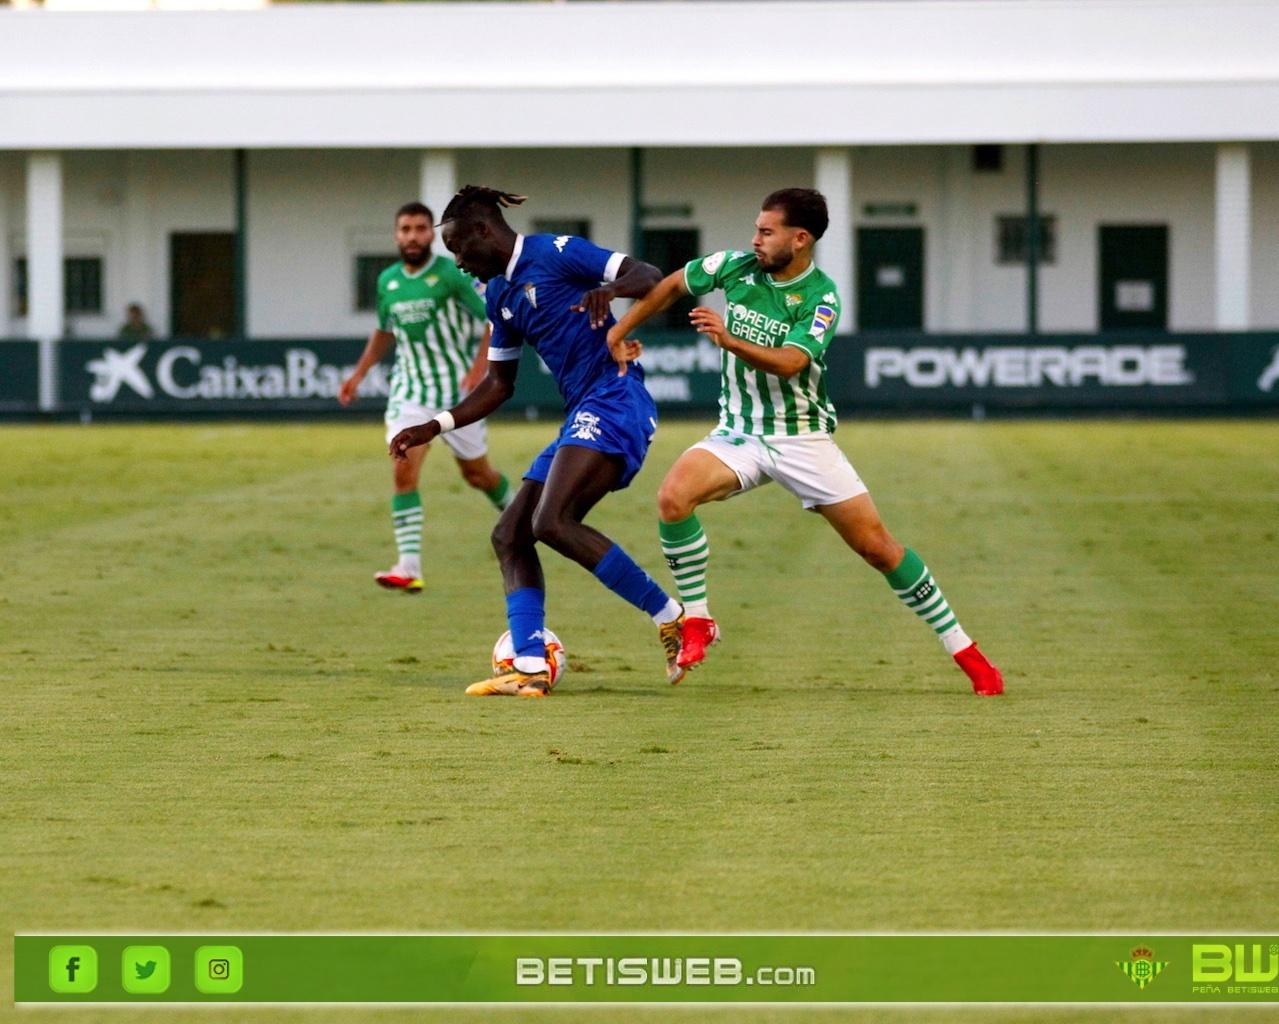 J-4-Betis-Deportivo-vs-San-Fernando-CD554